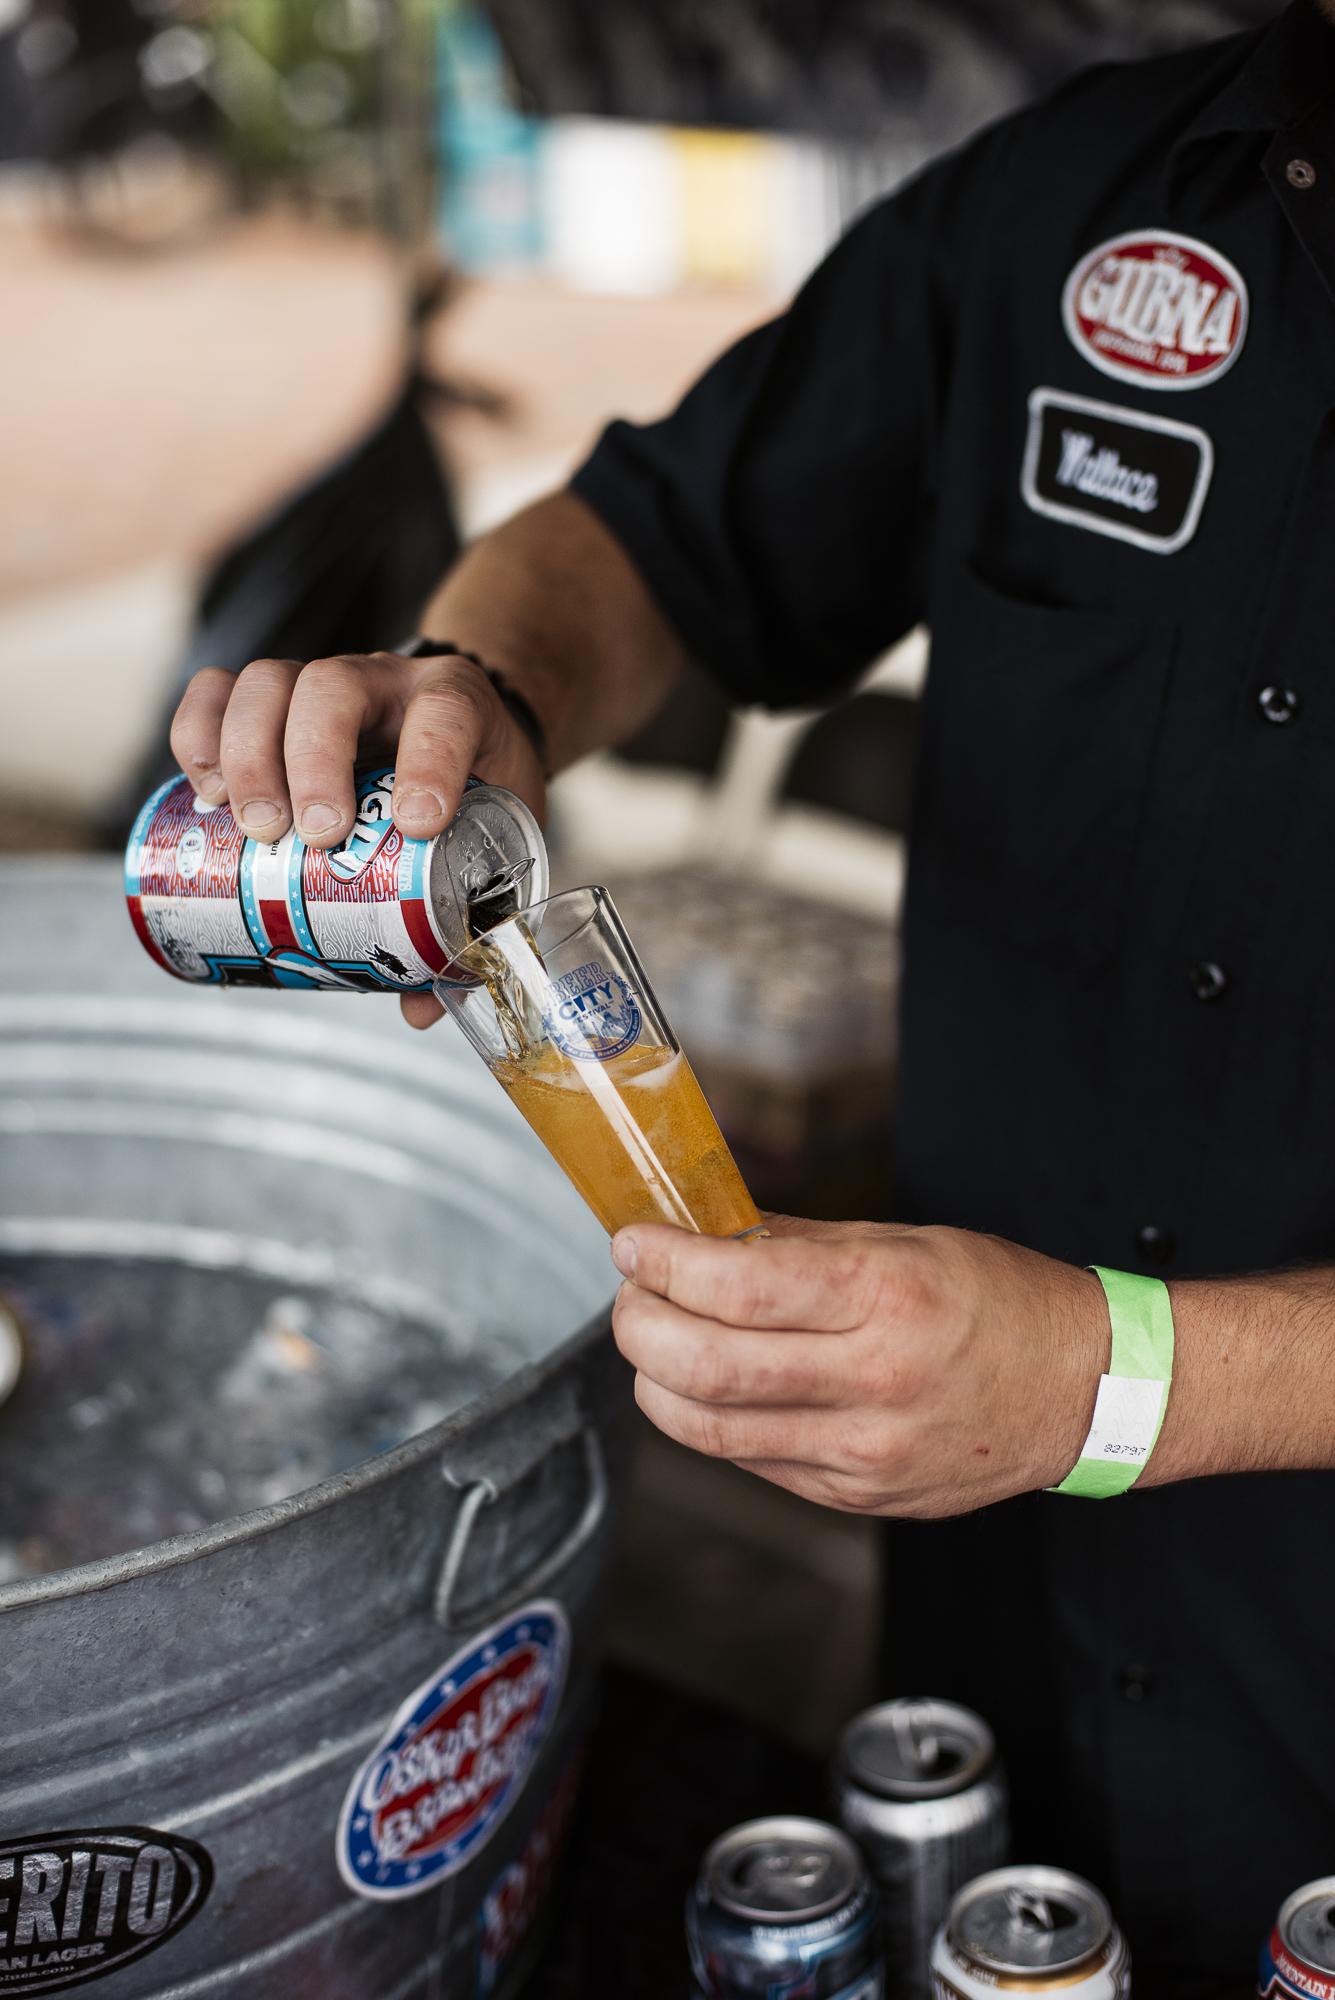 Oskar Blues Brewing at Beer City Fest 2017 in Asheville North Carolina by Jack Sorokin Photography